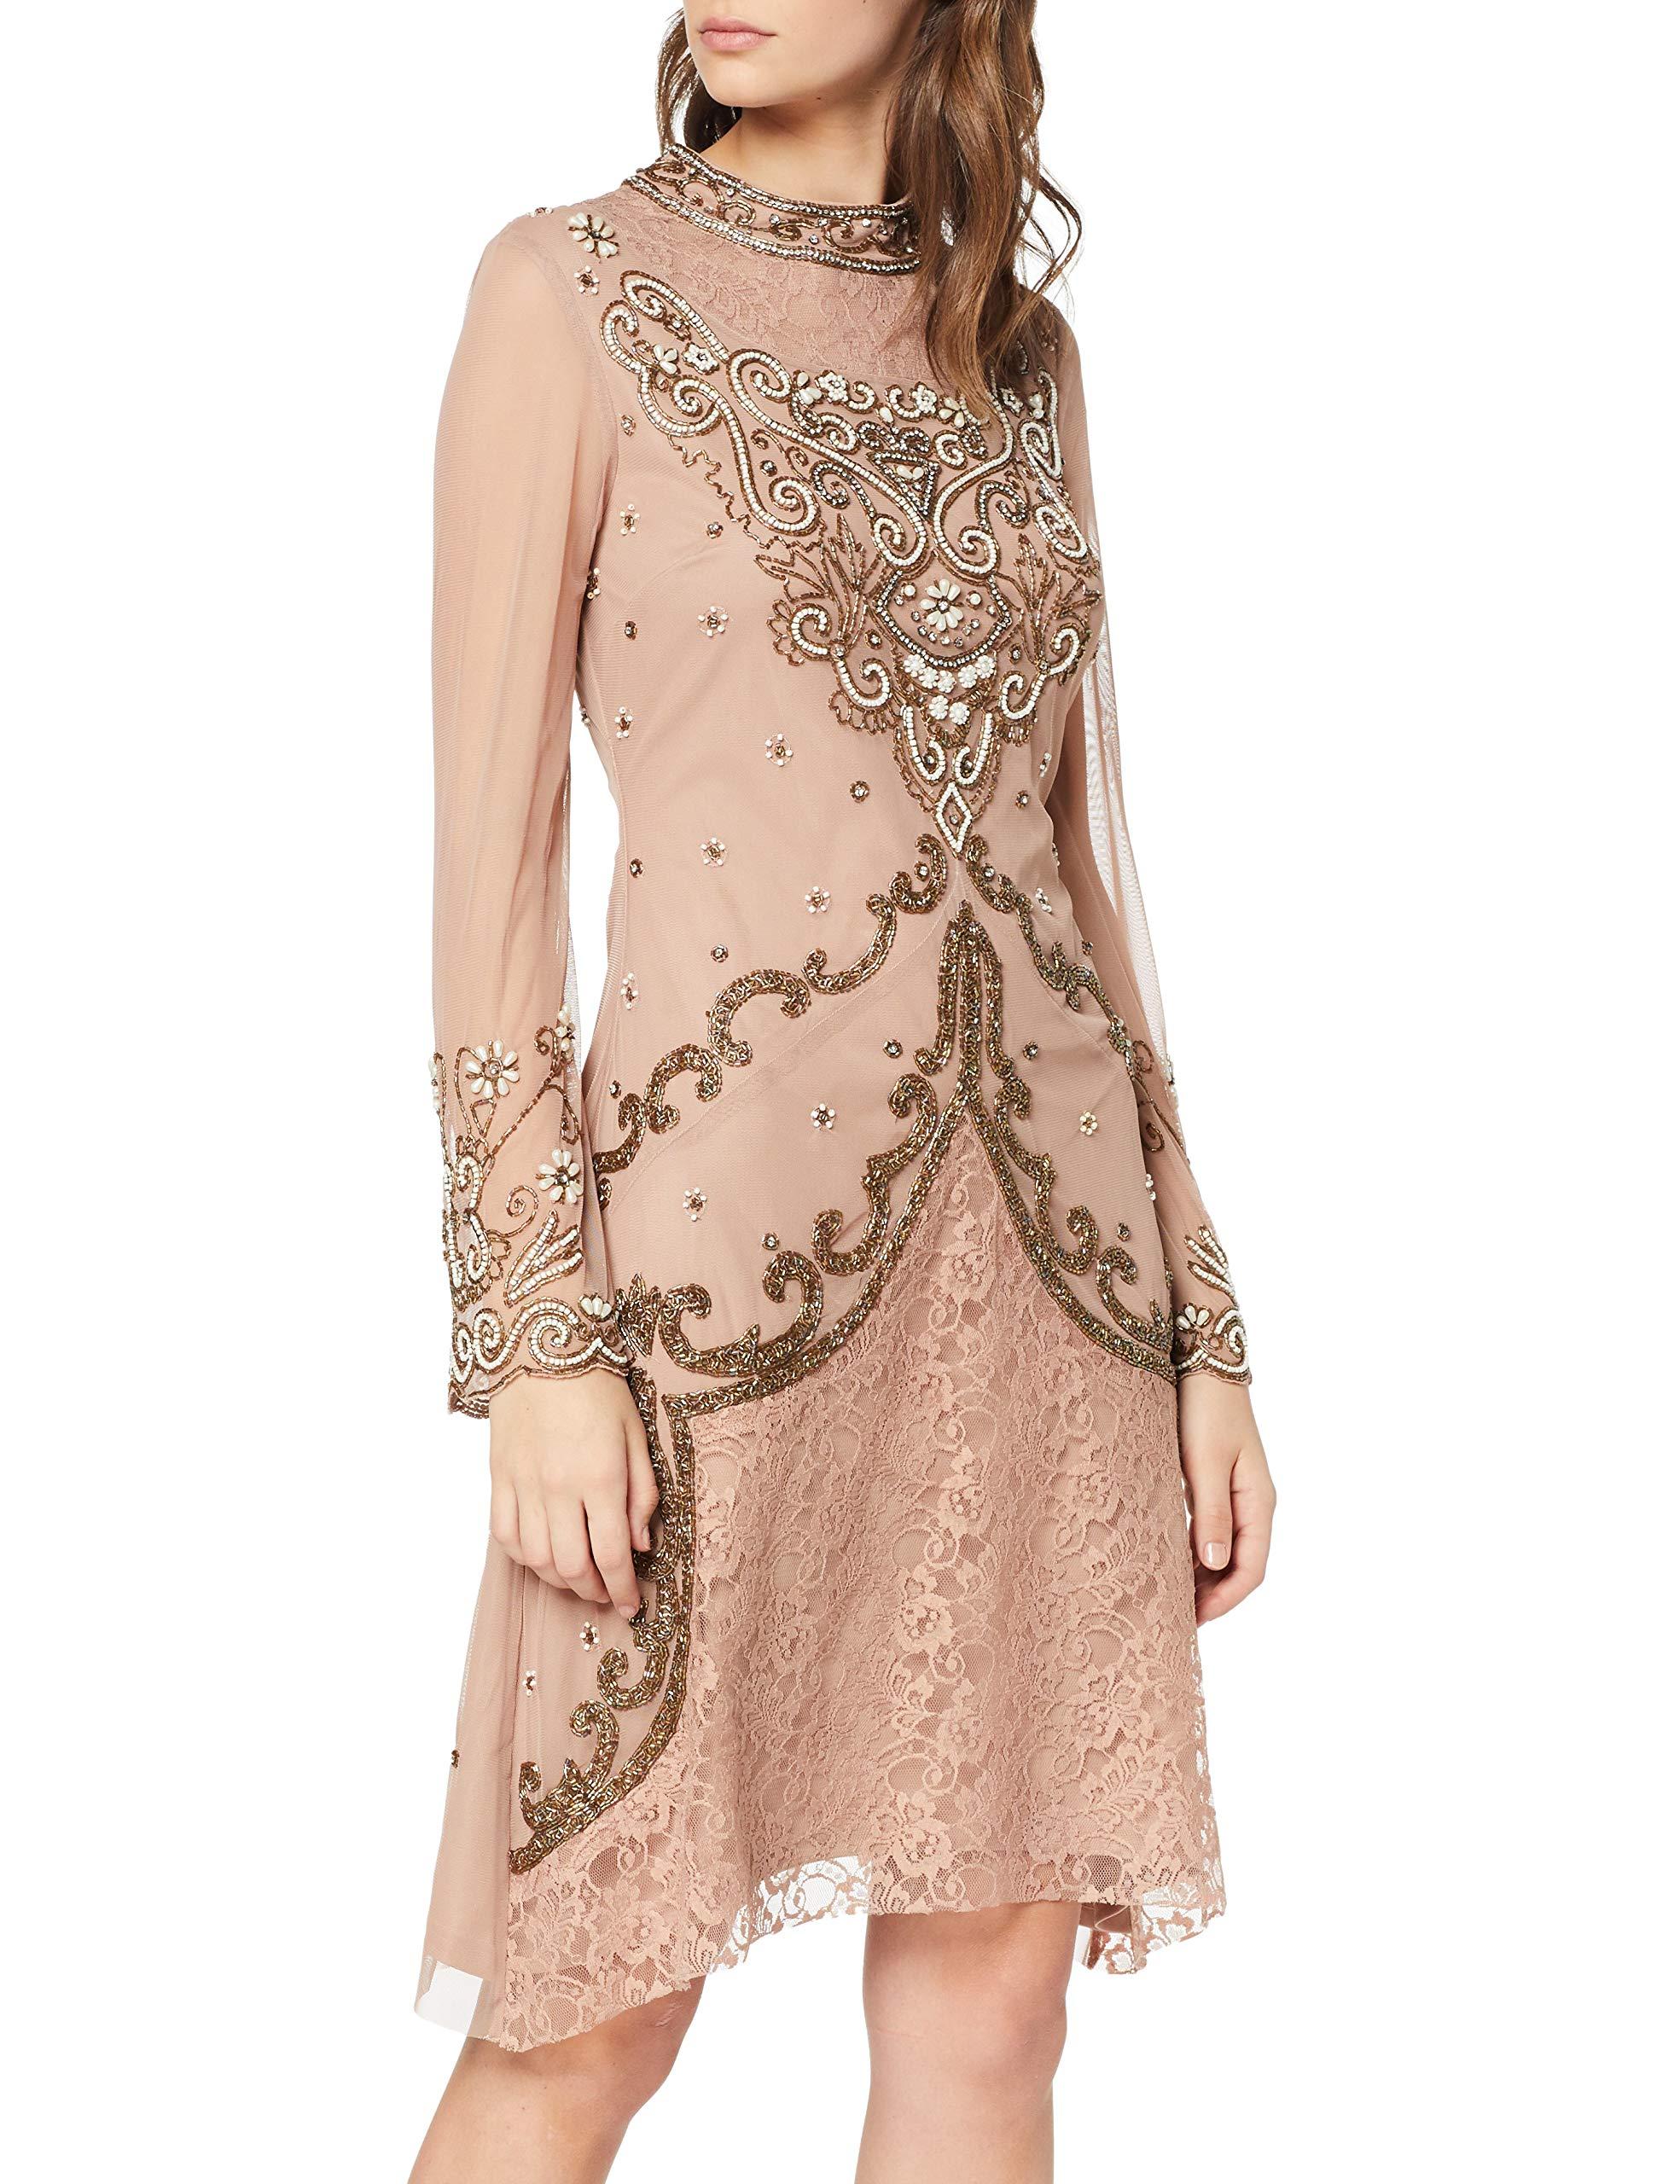 FabricantUk 10Femme Embellished Neck Pink38taille High SoiréeRosebarely Mini Frock Frill And De Robe Fatima Dress qUSVpzM